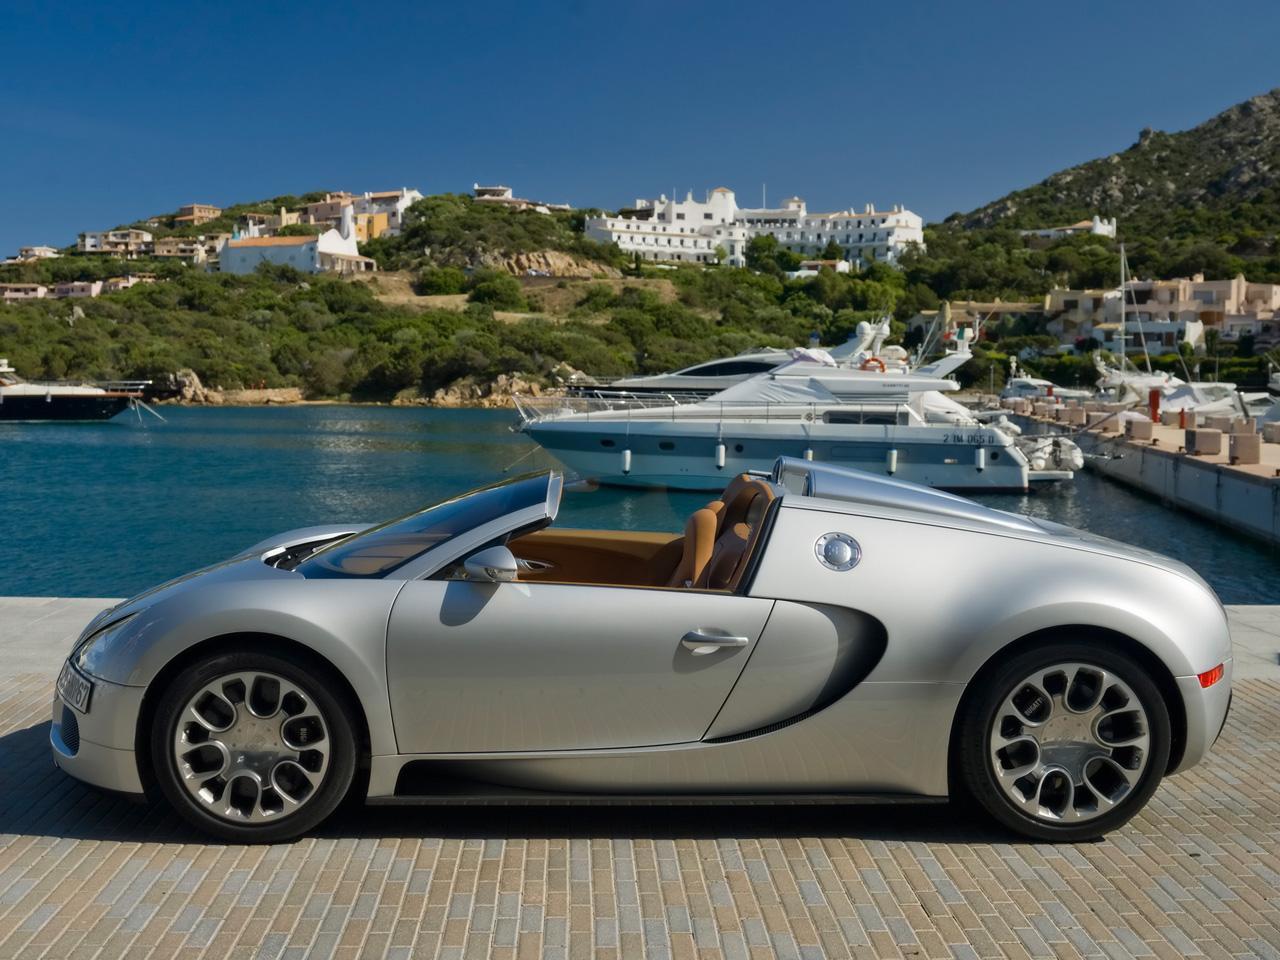 Wallpaper World: Bugatti Veyron 16.4 Grand Sport Photos